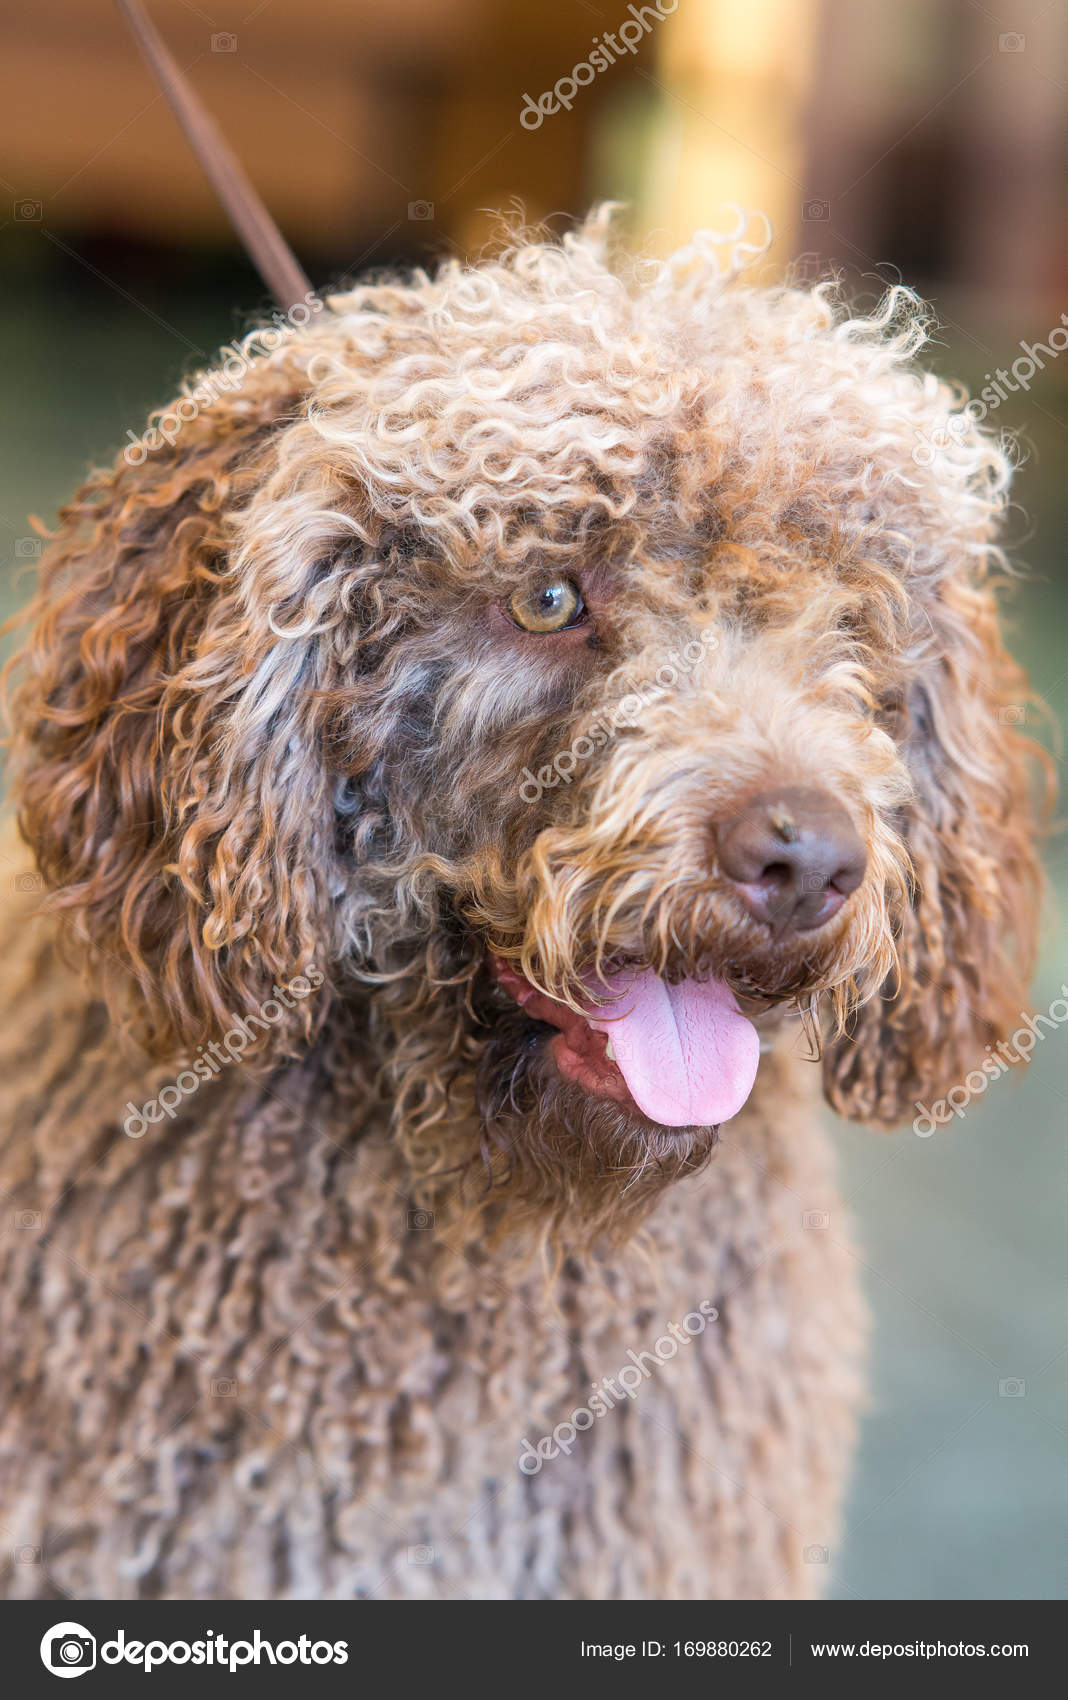 Spansk vattenhund